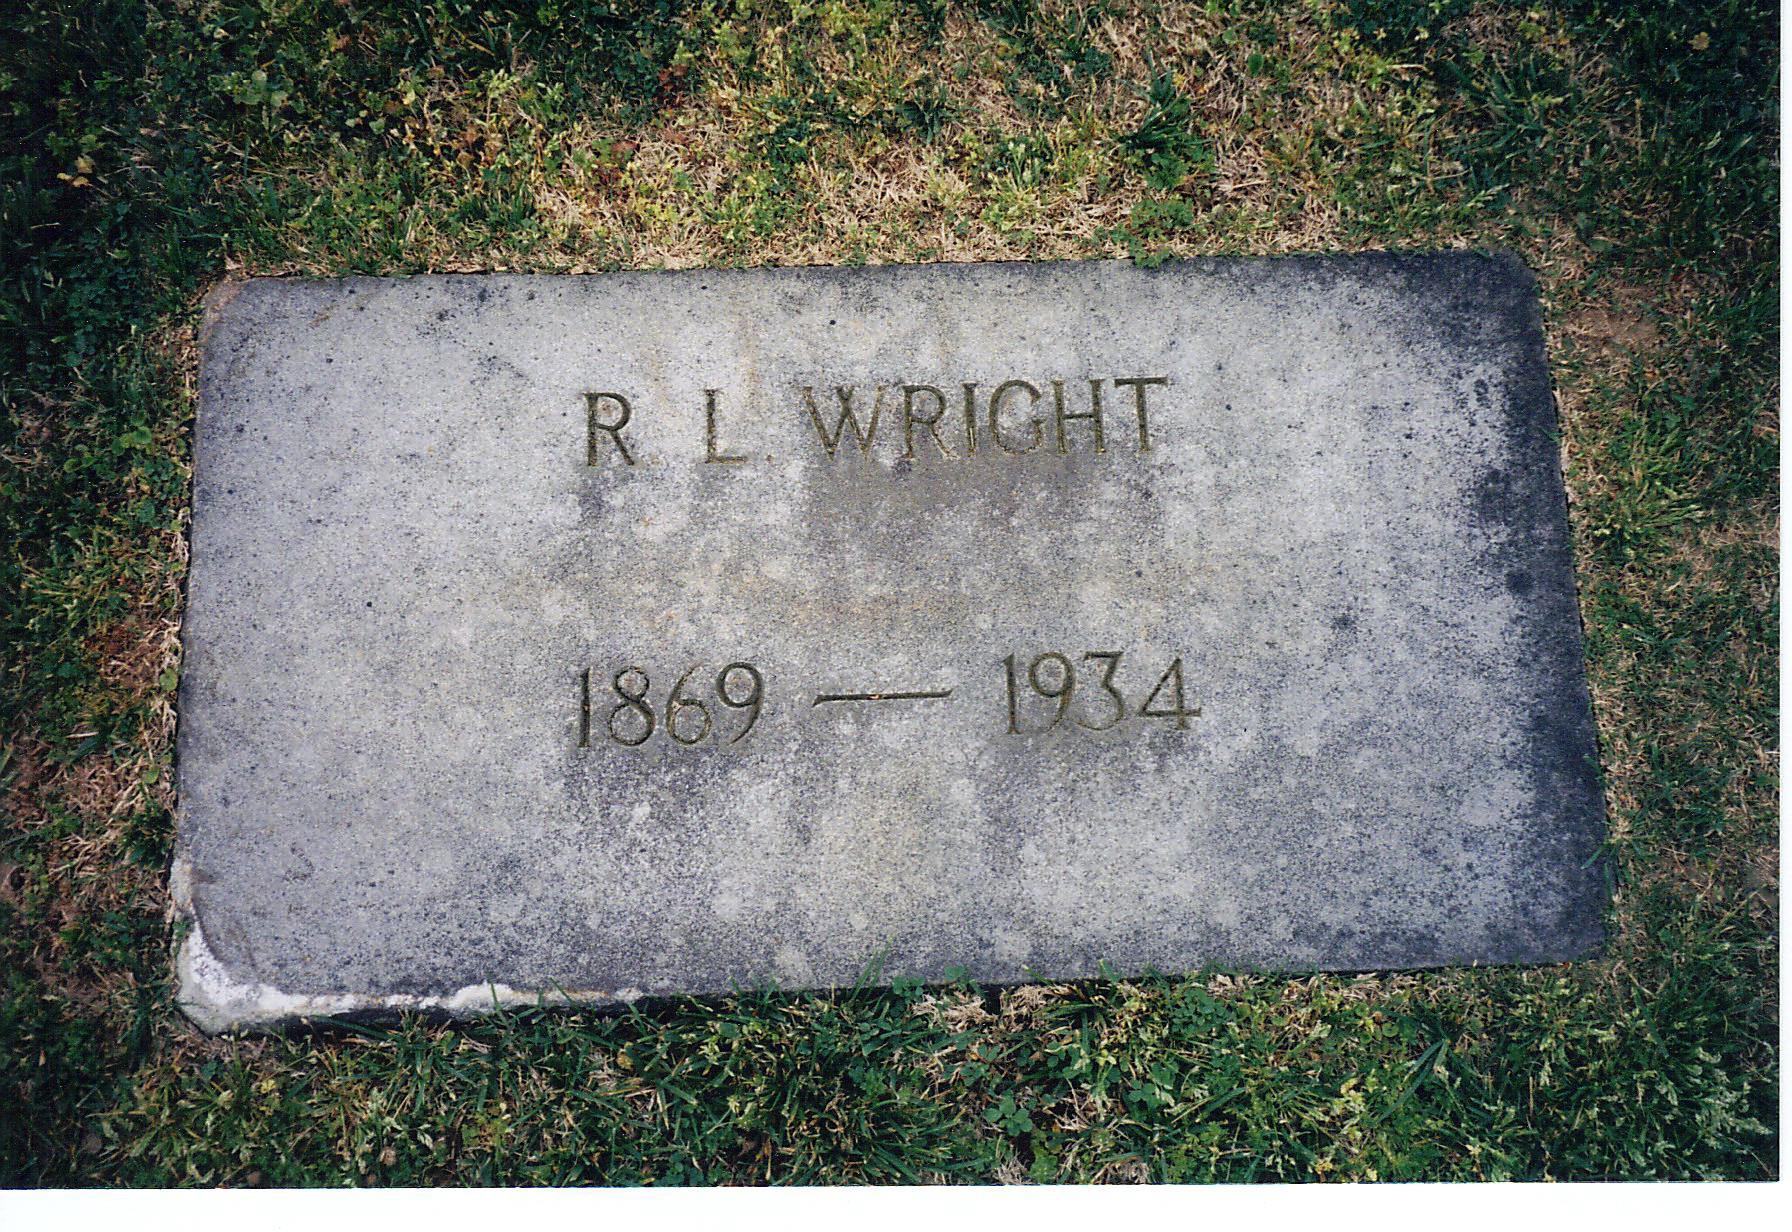 LaMarr Wright